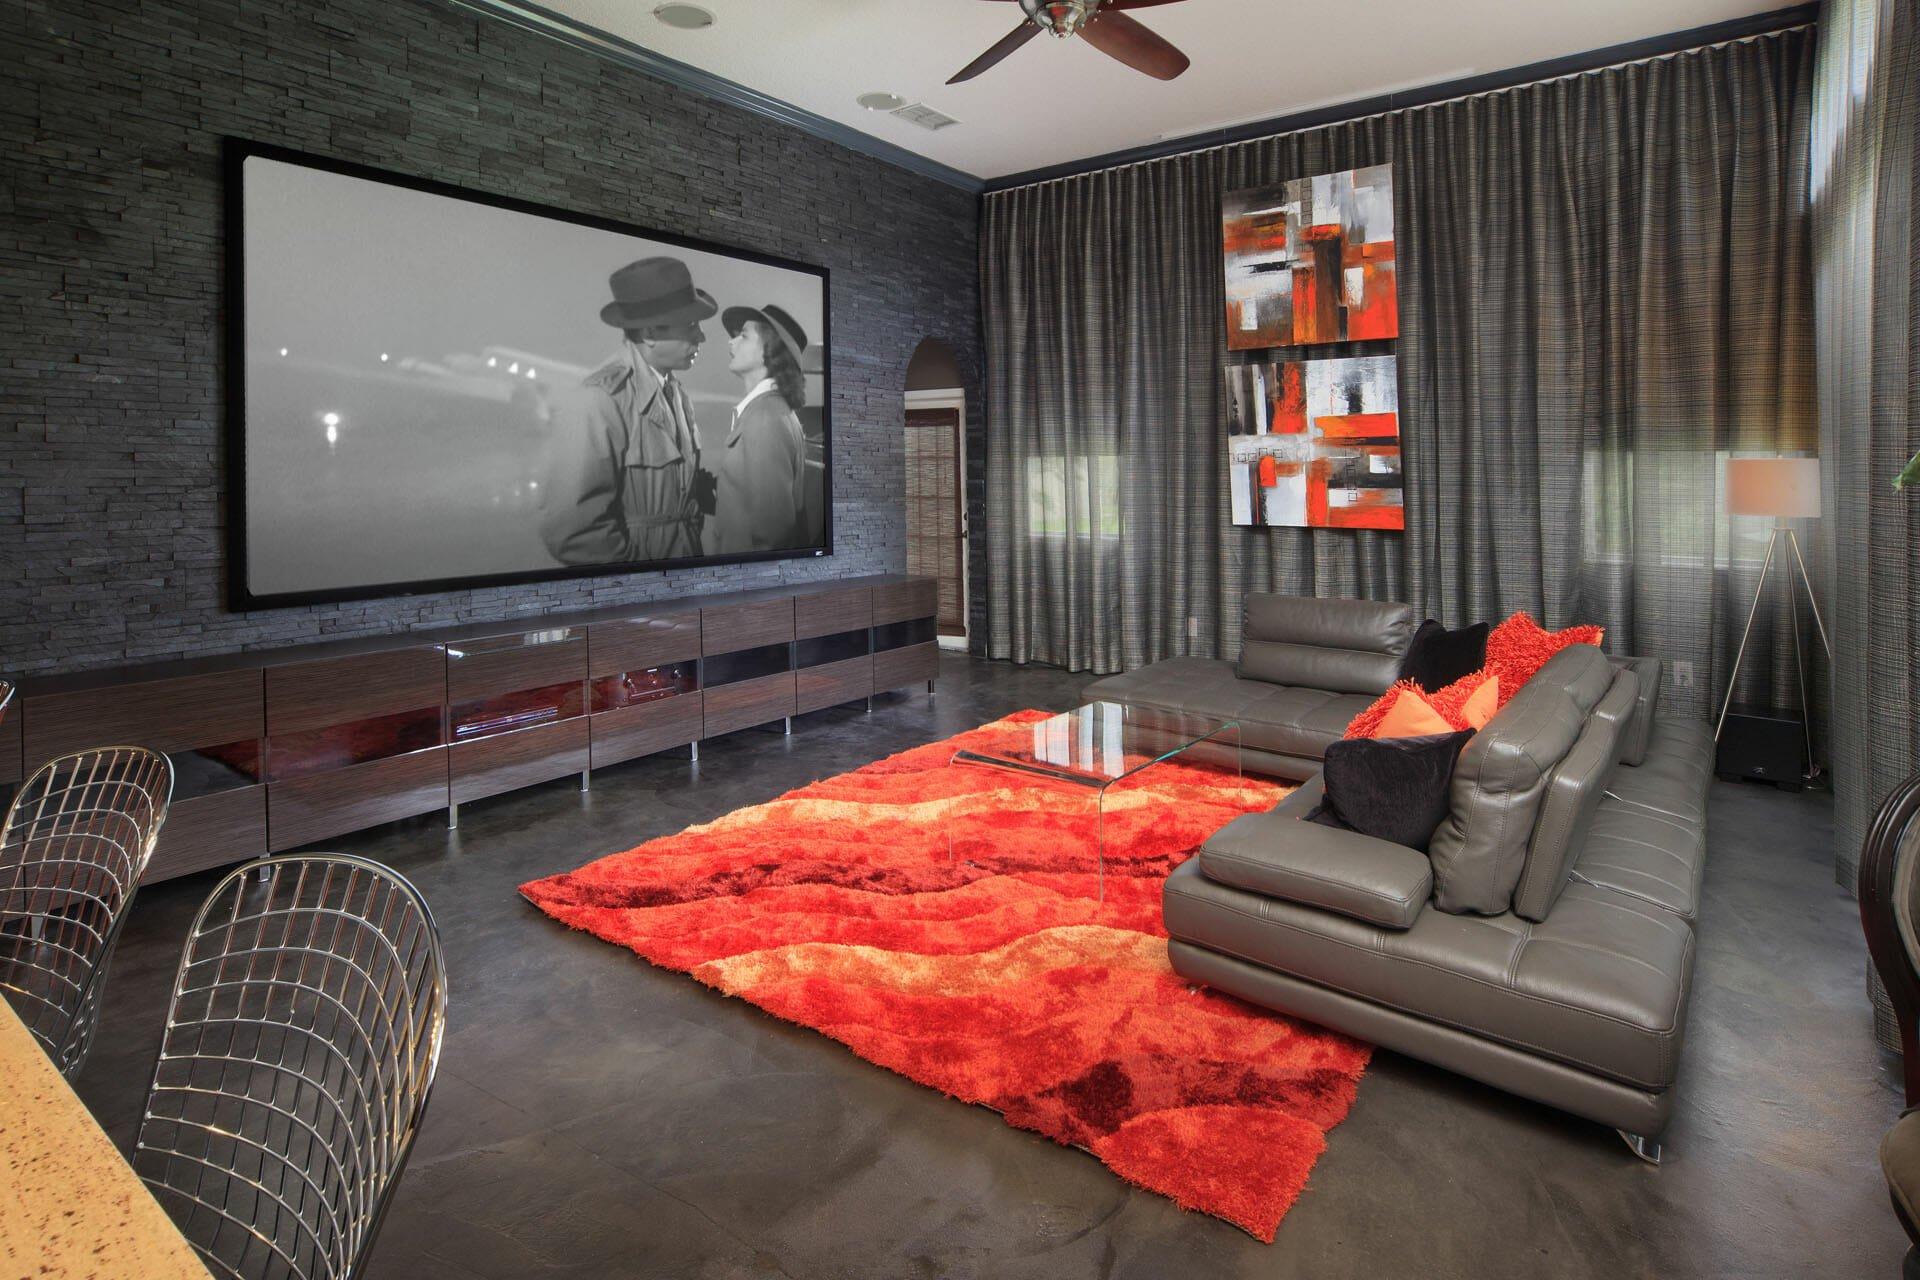 orlando-interior-designers-living-room-morrone-interiors